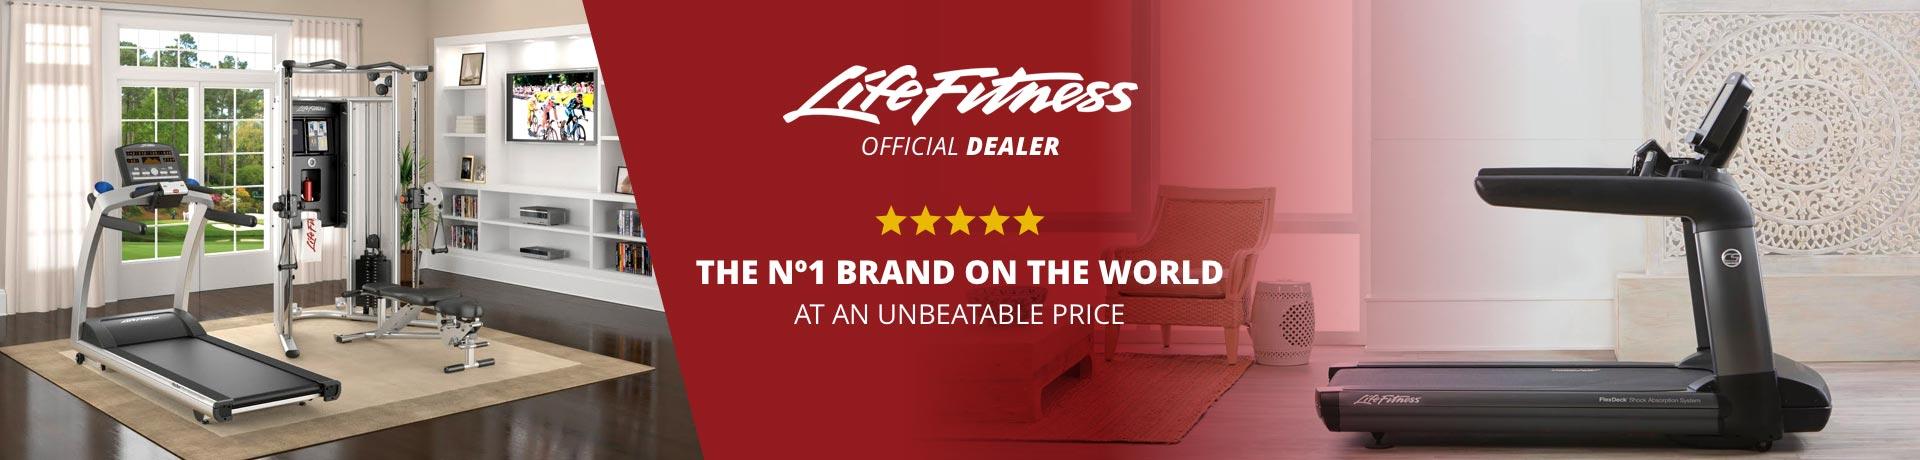 sale-life-fitness